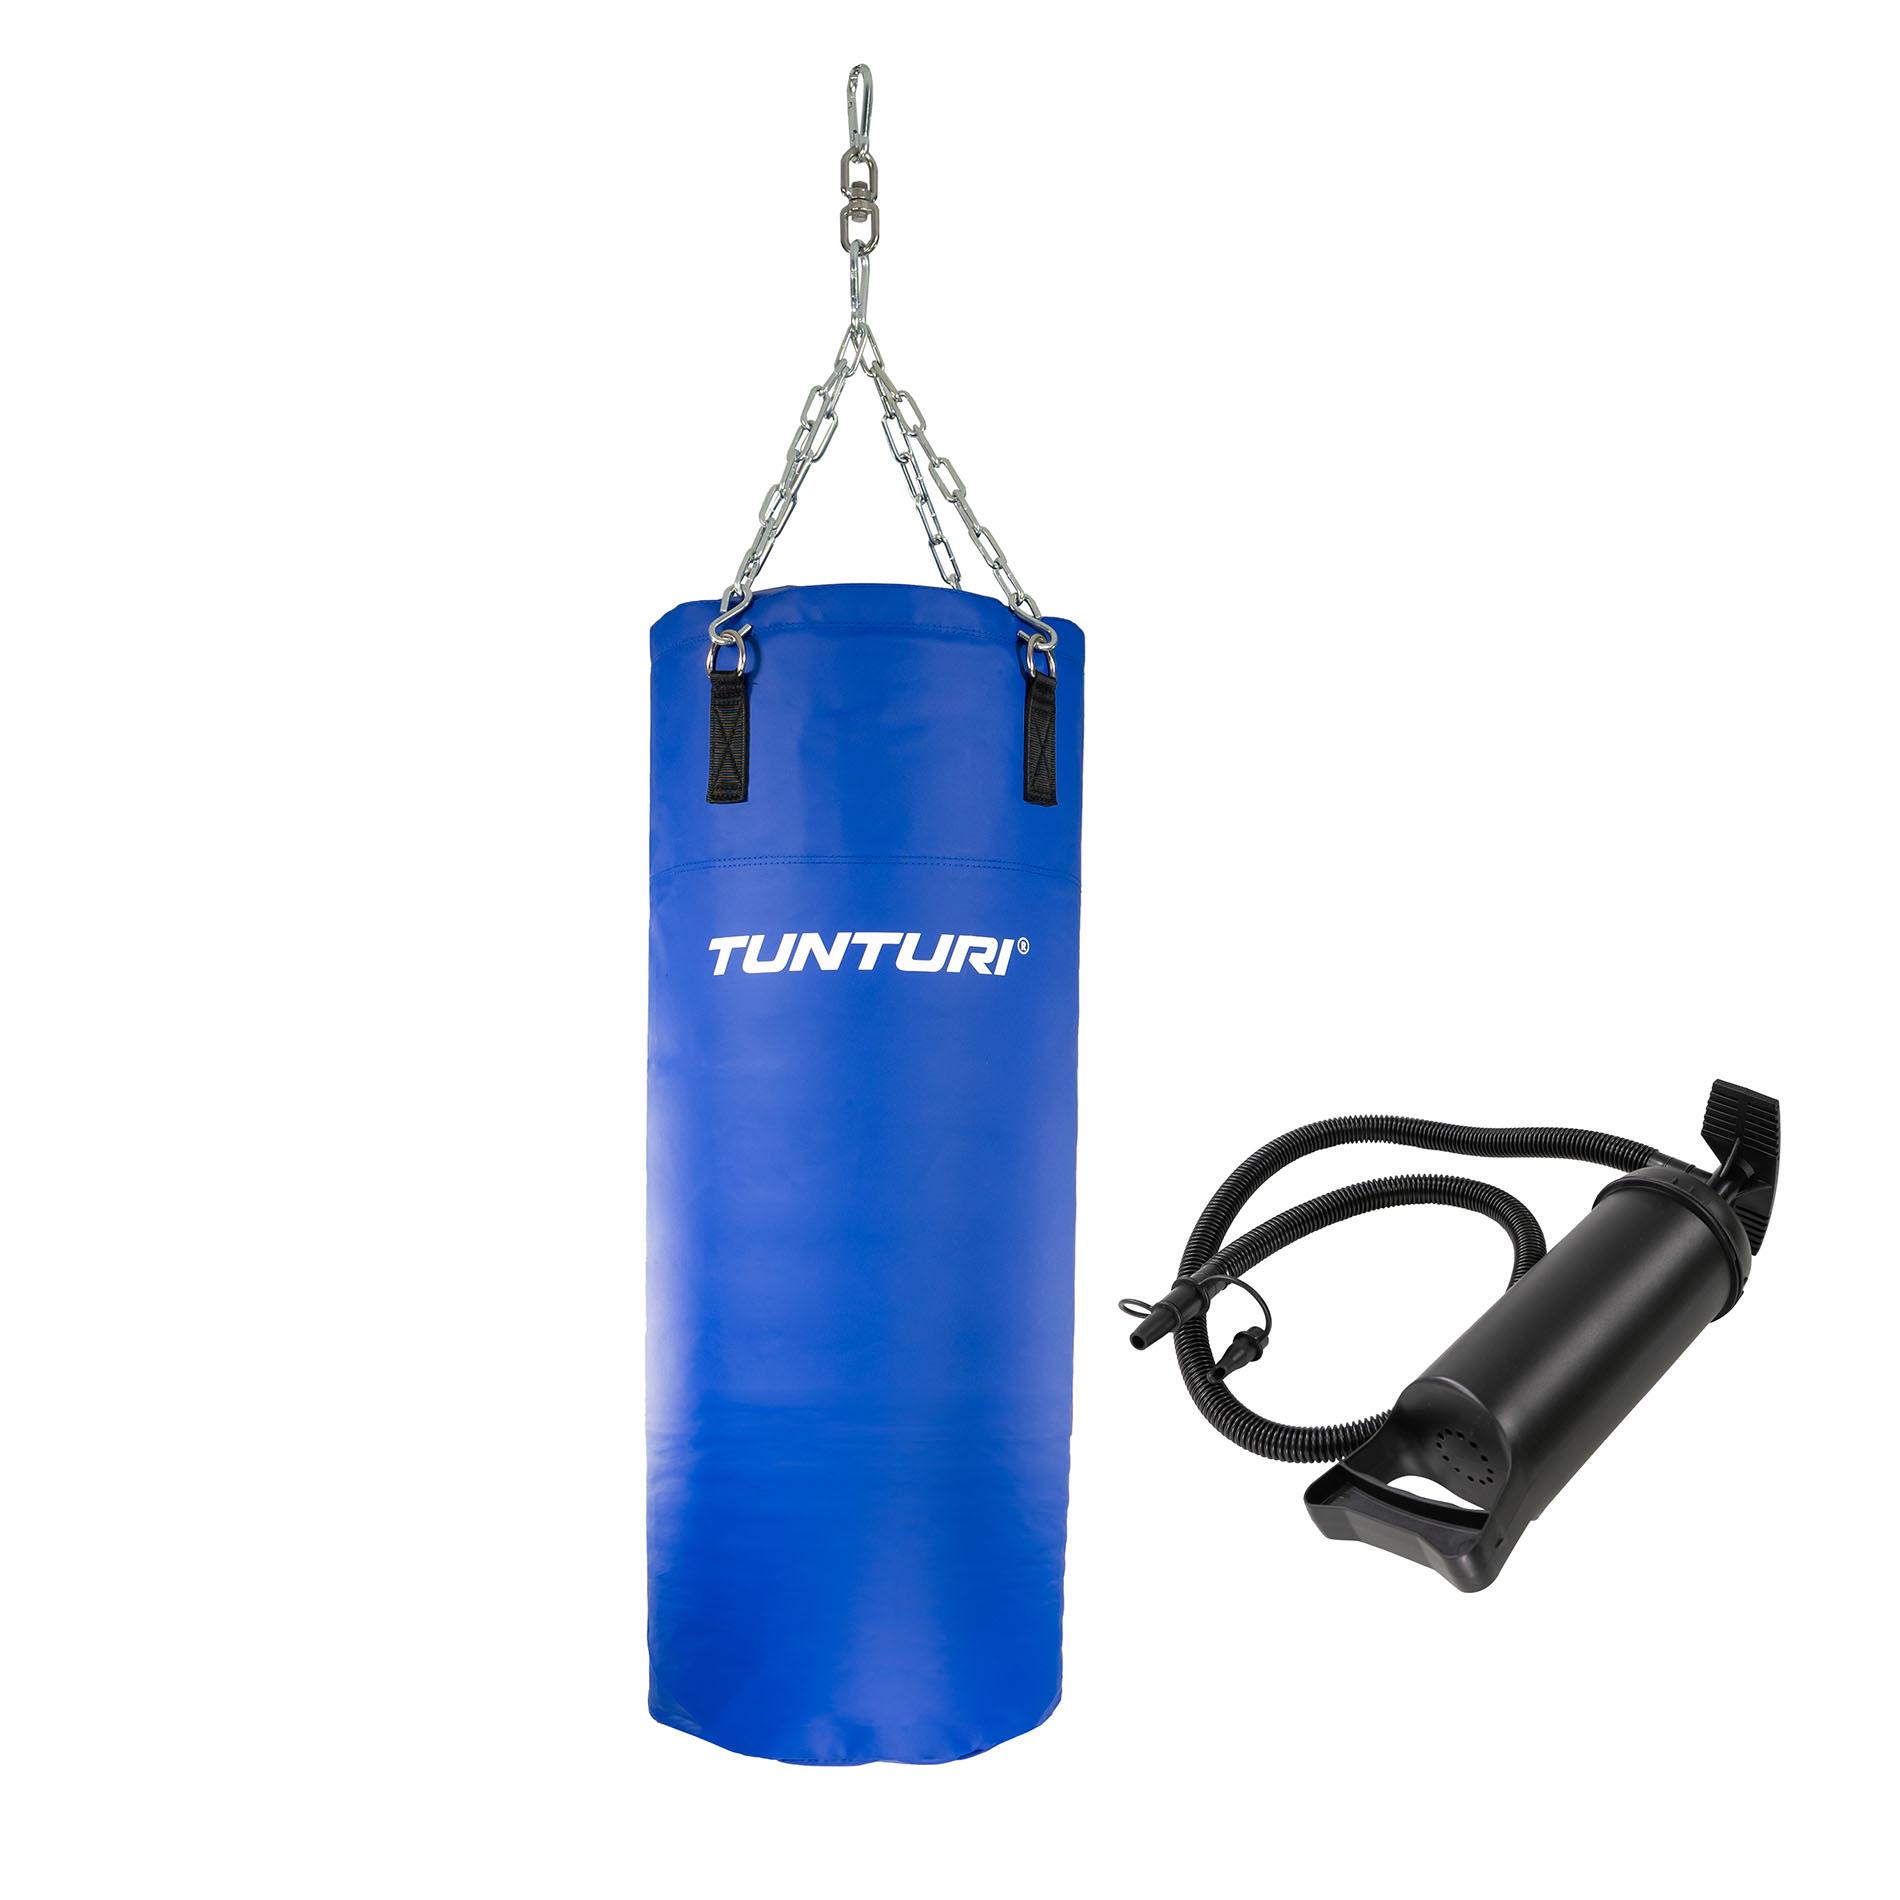 Aqua punching bag - boxing bag